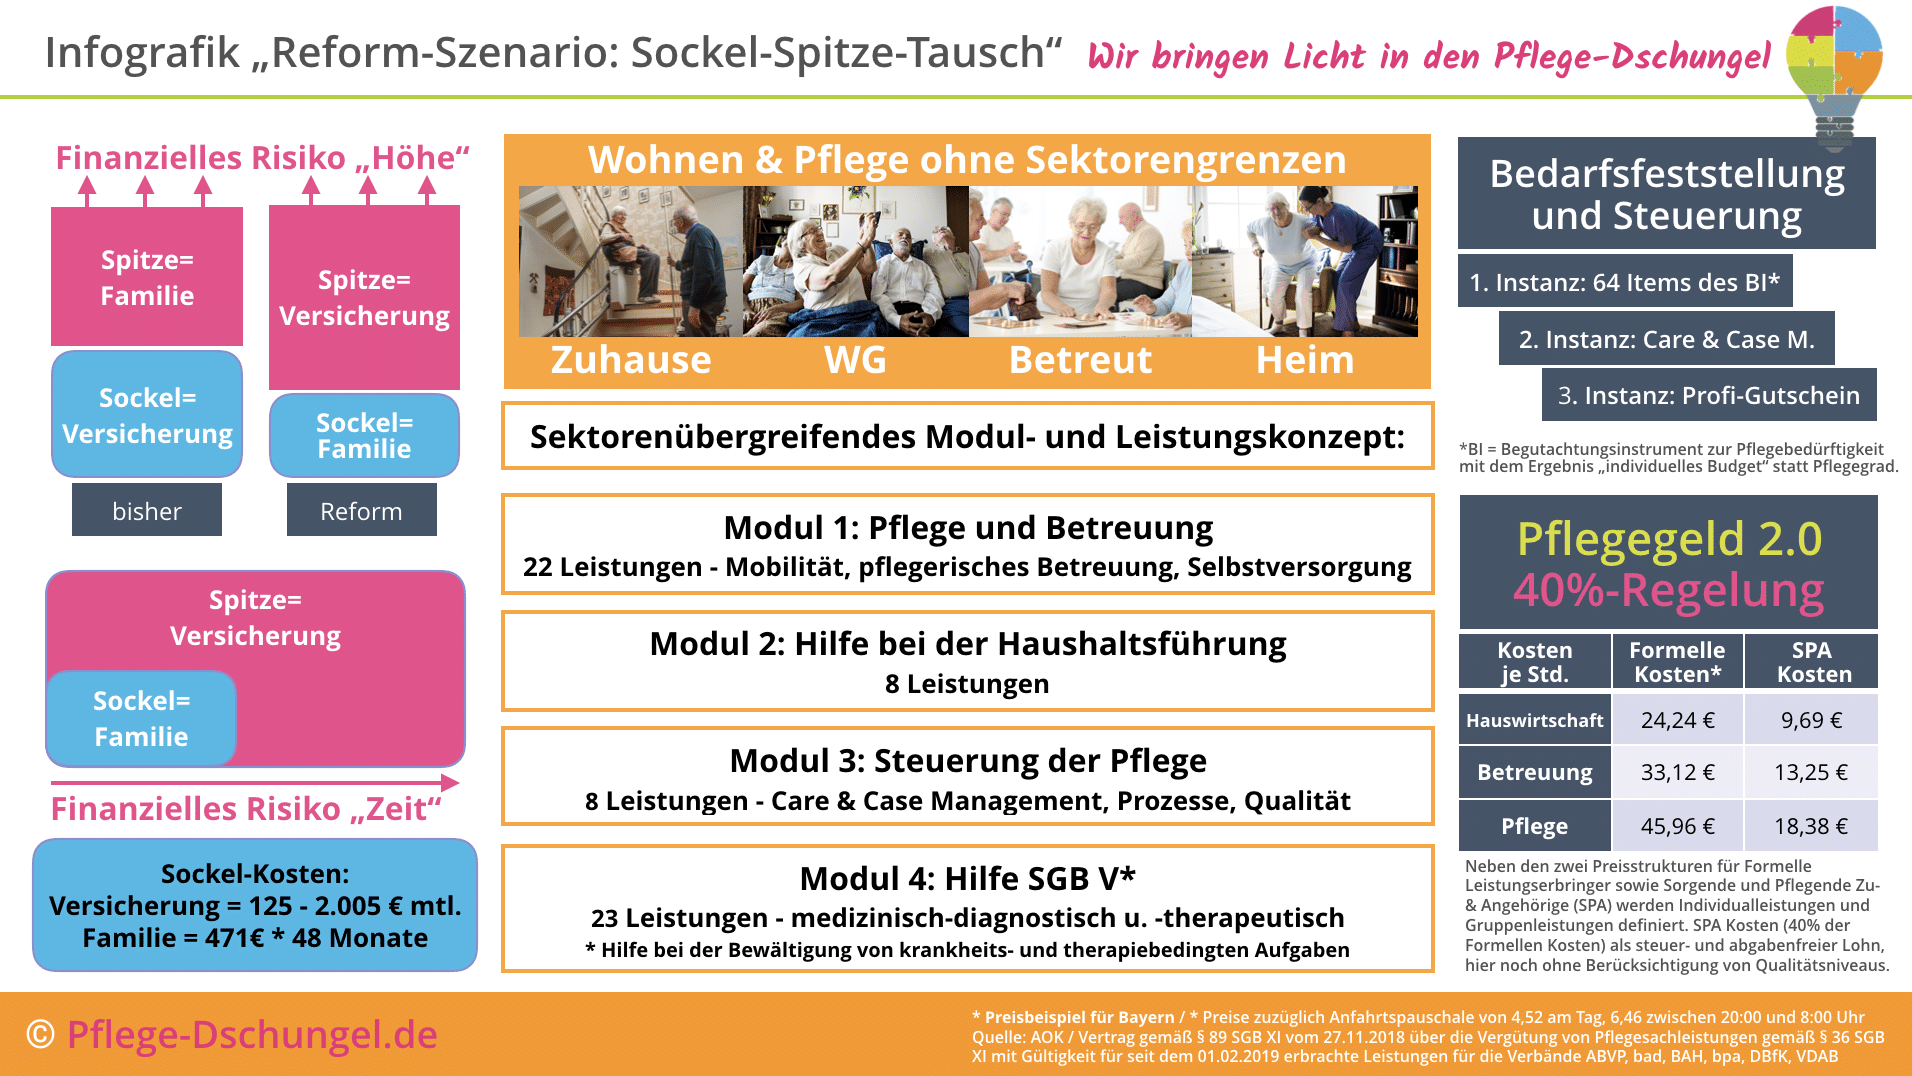 Sockel-Spitze-Tausch